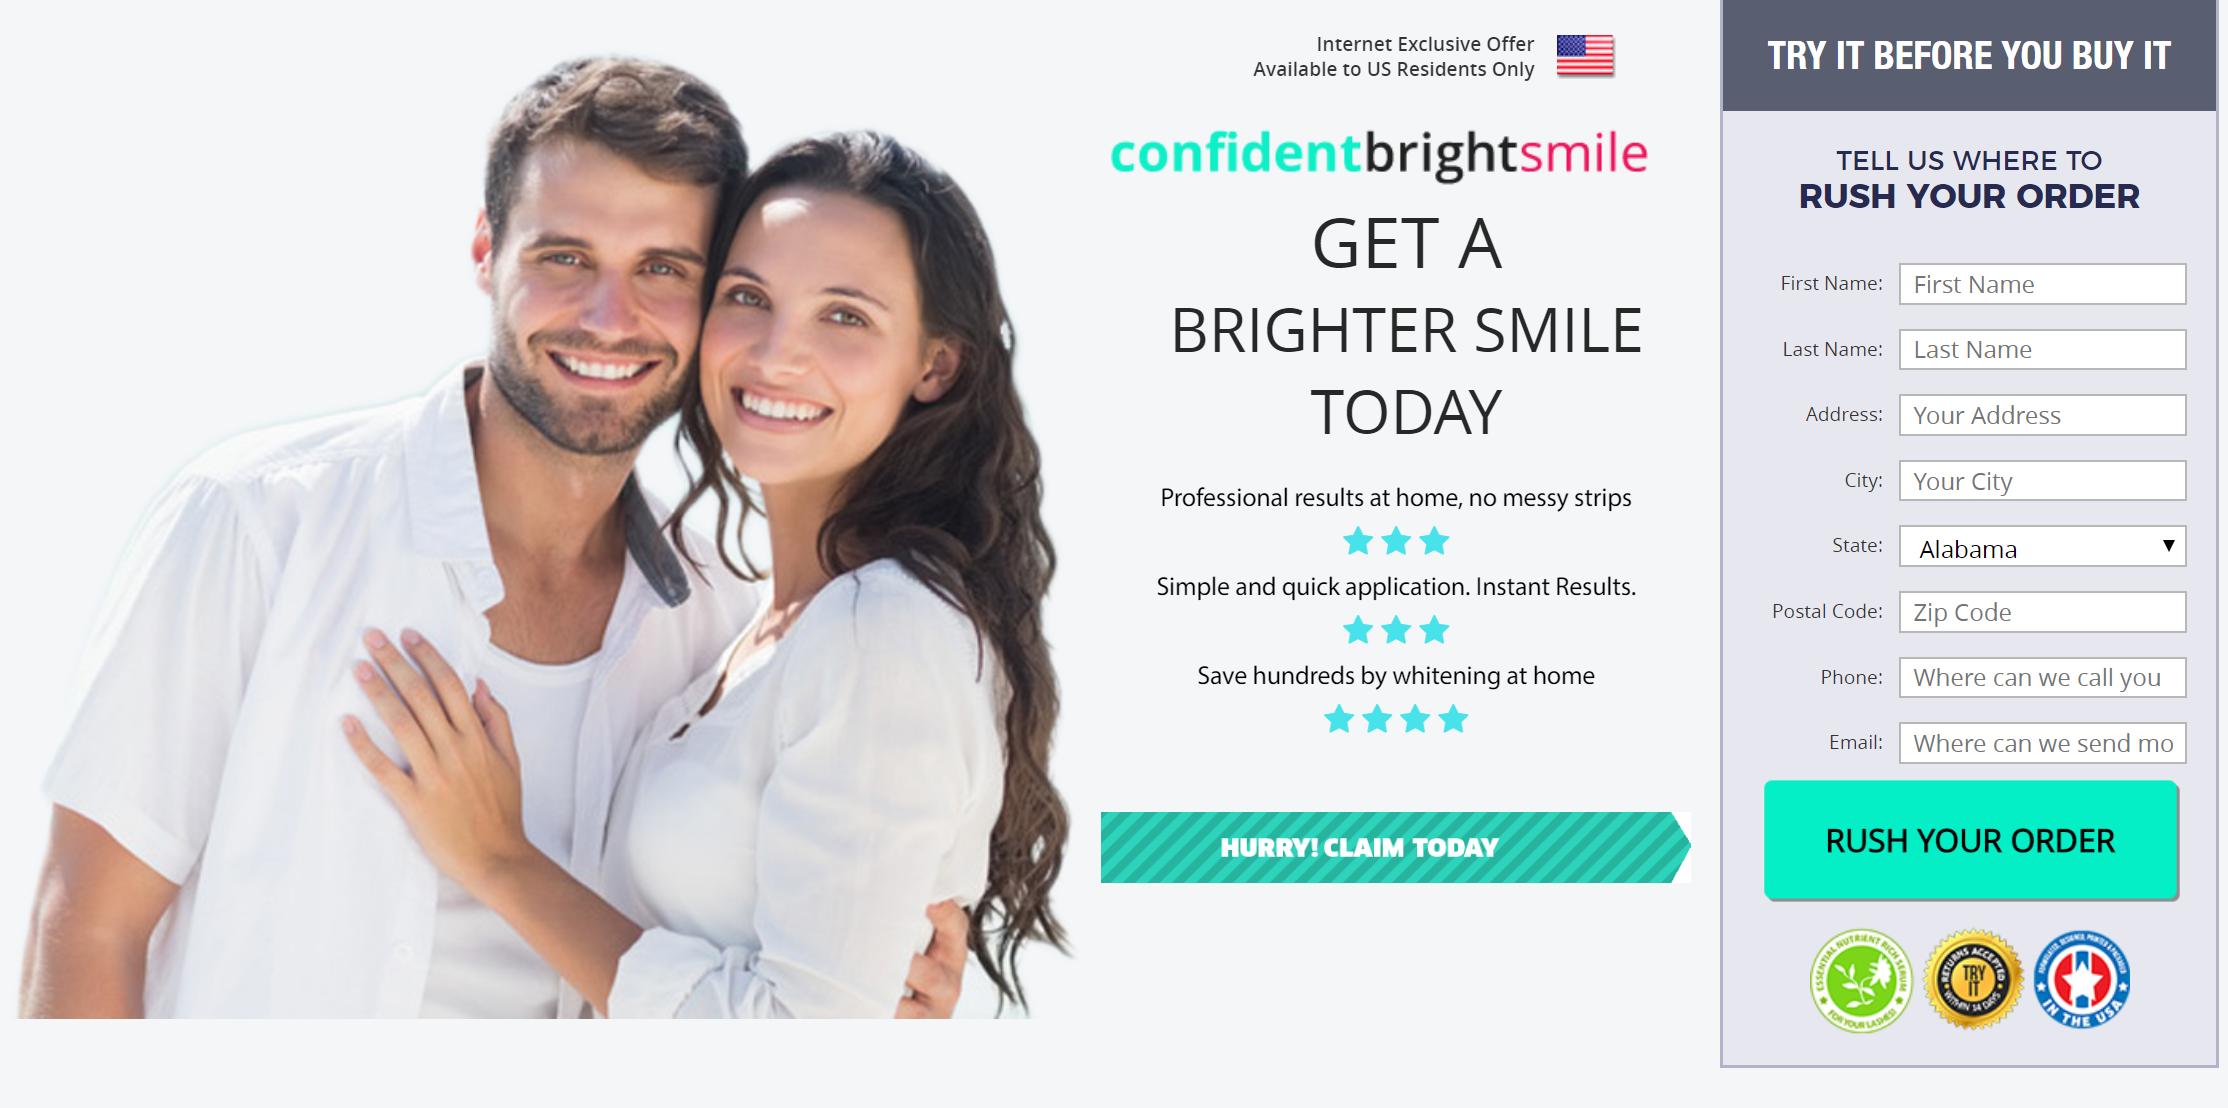 Confident Bright Smile order